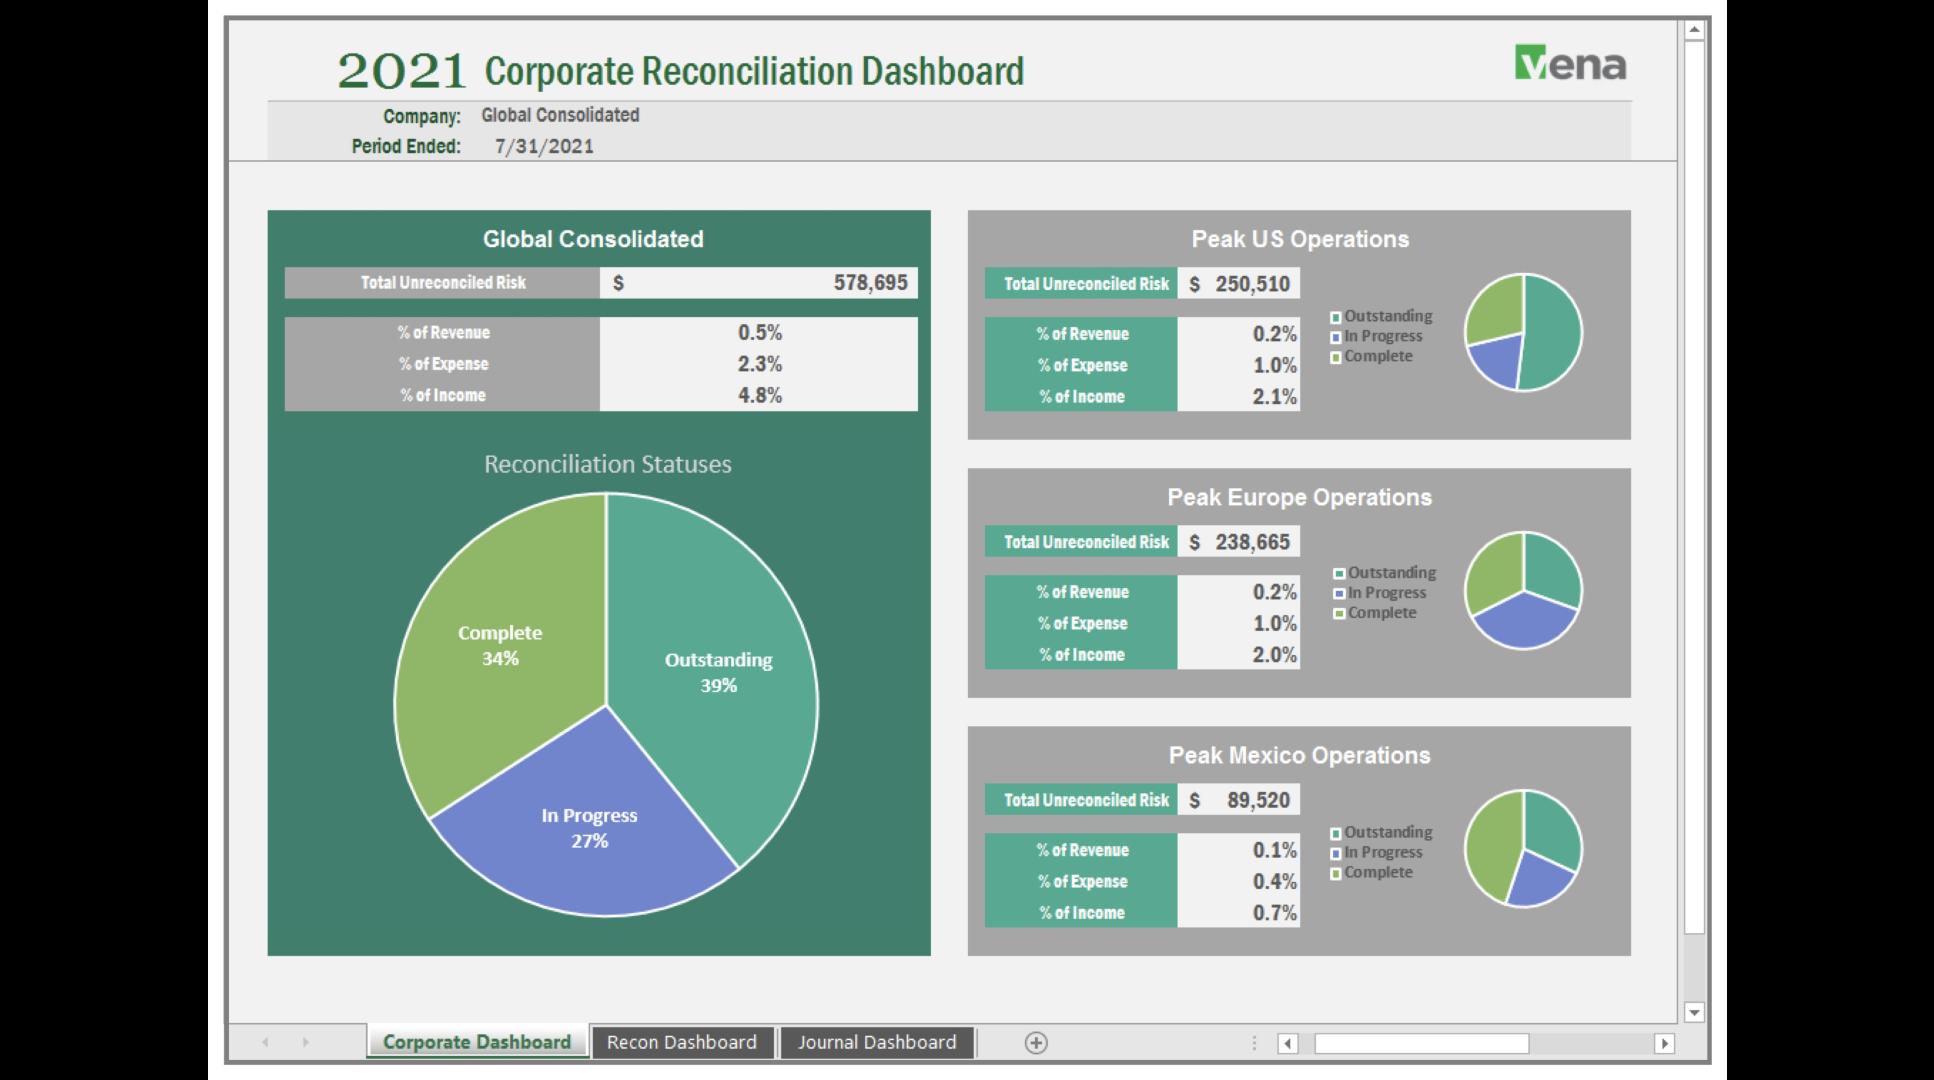 CorporateRec-Dashboard